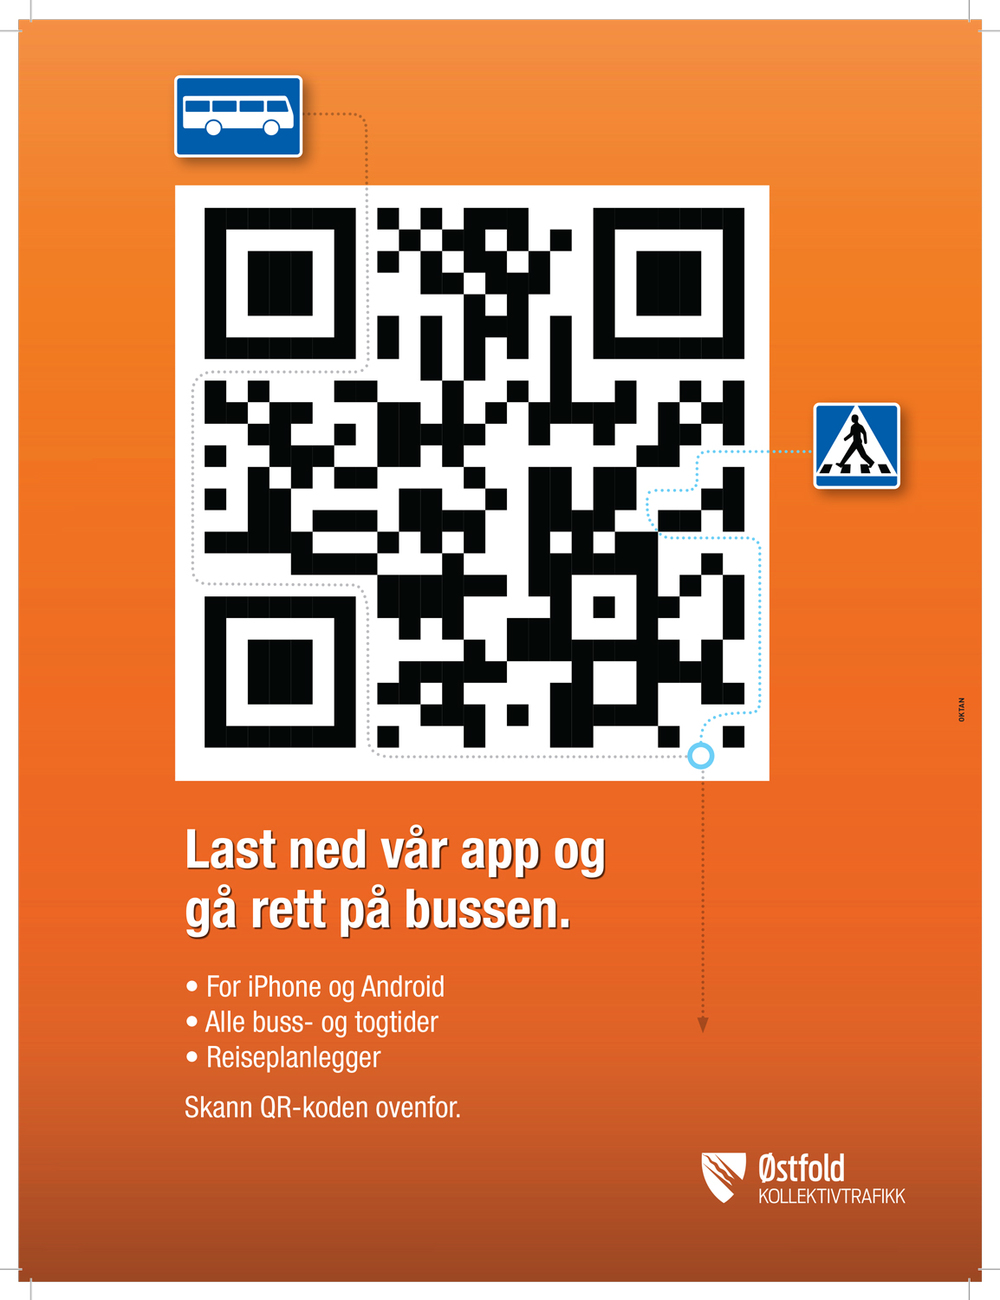 Østfold Kollektivtrafikk